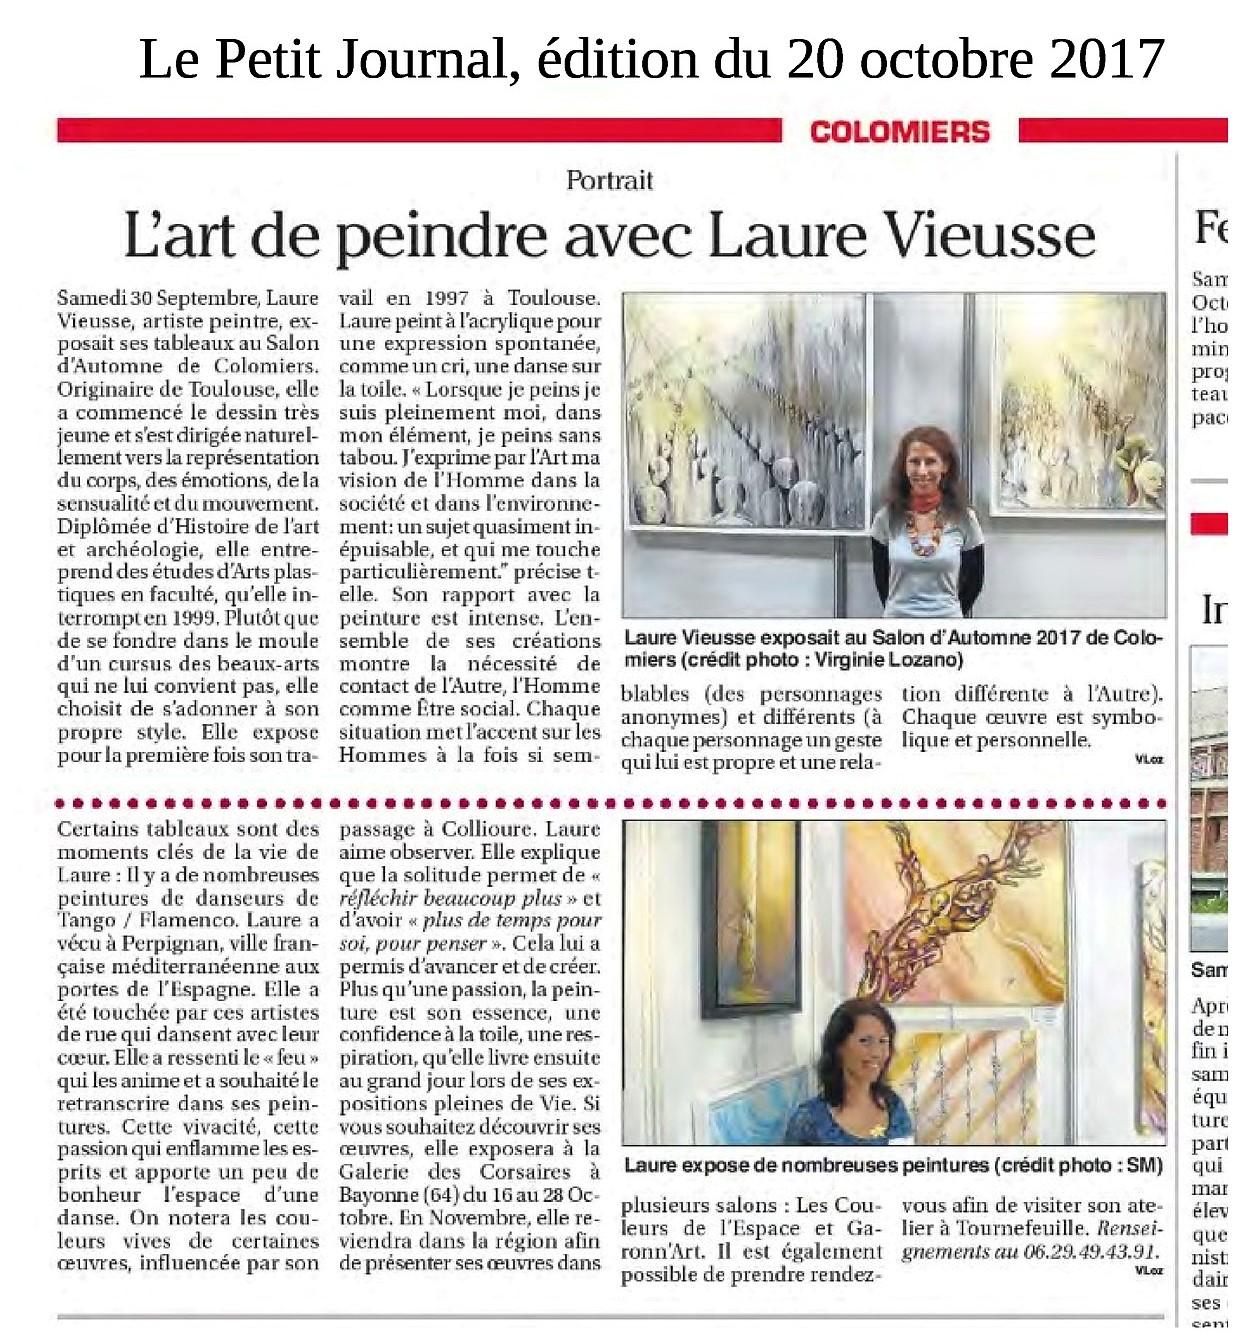 petit_journal_20_octobre_2017-page0.jpg